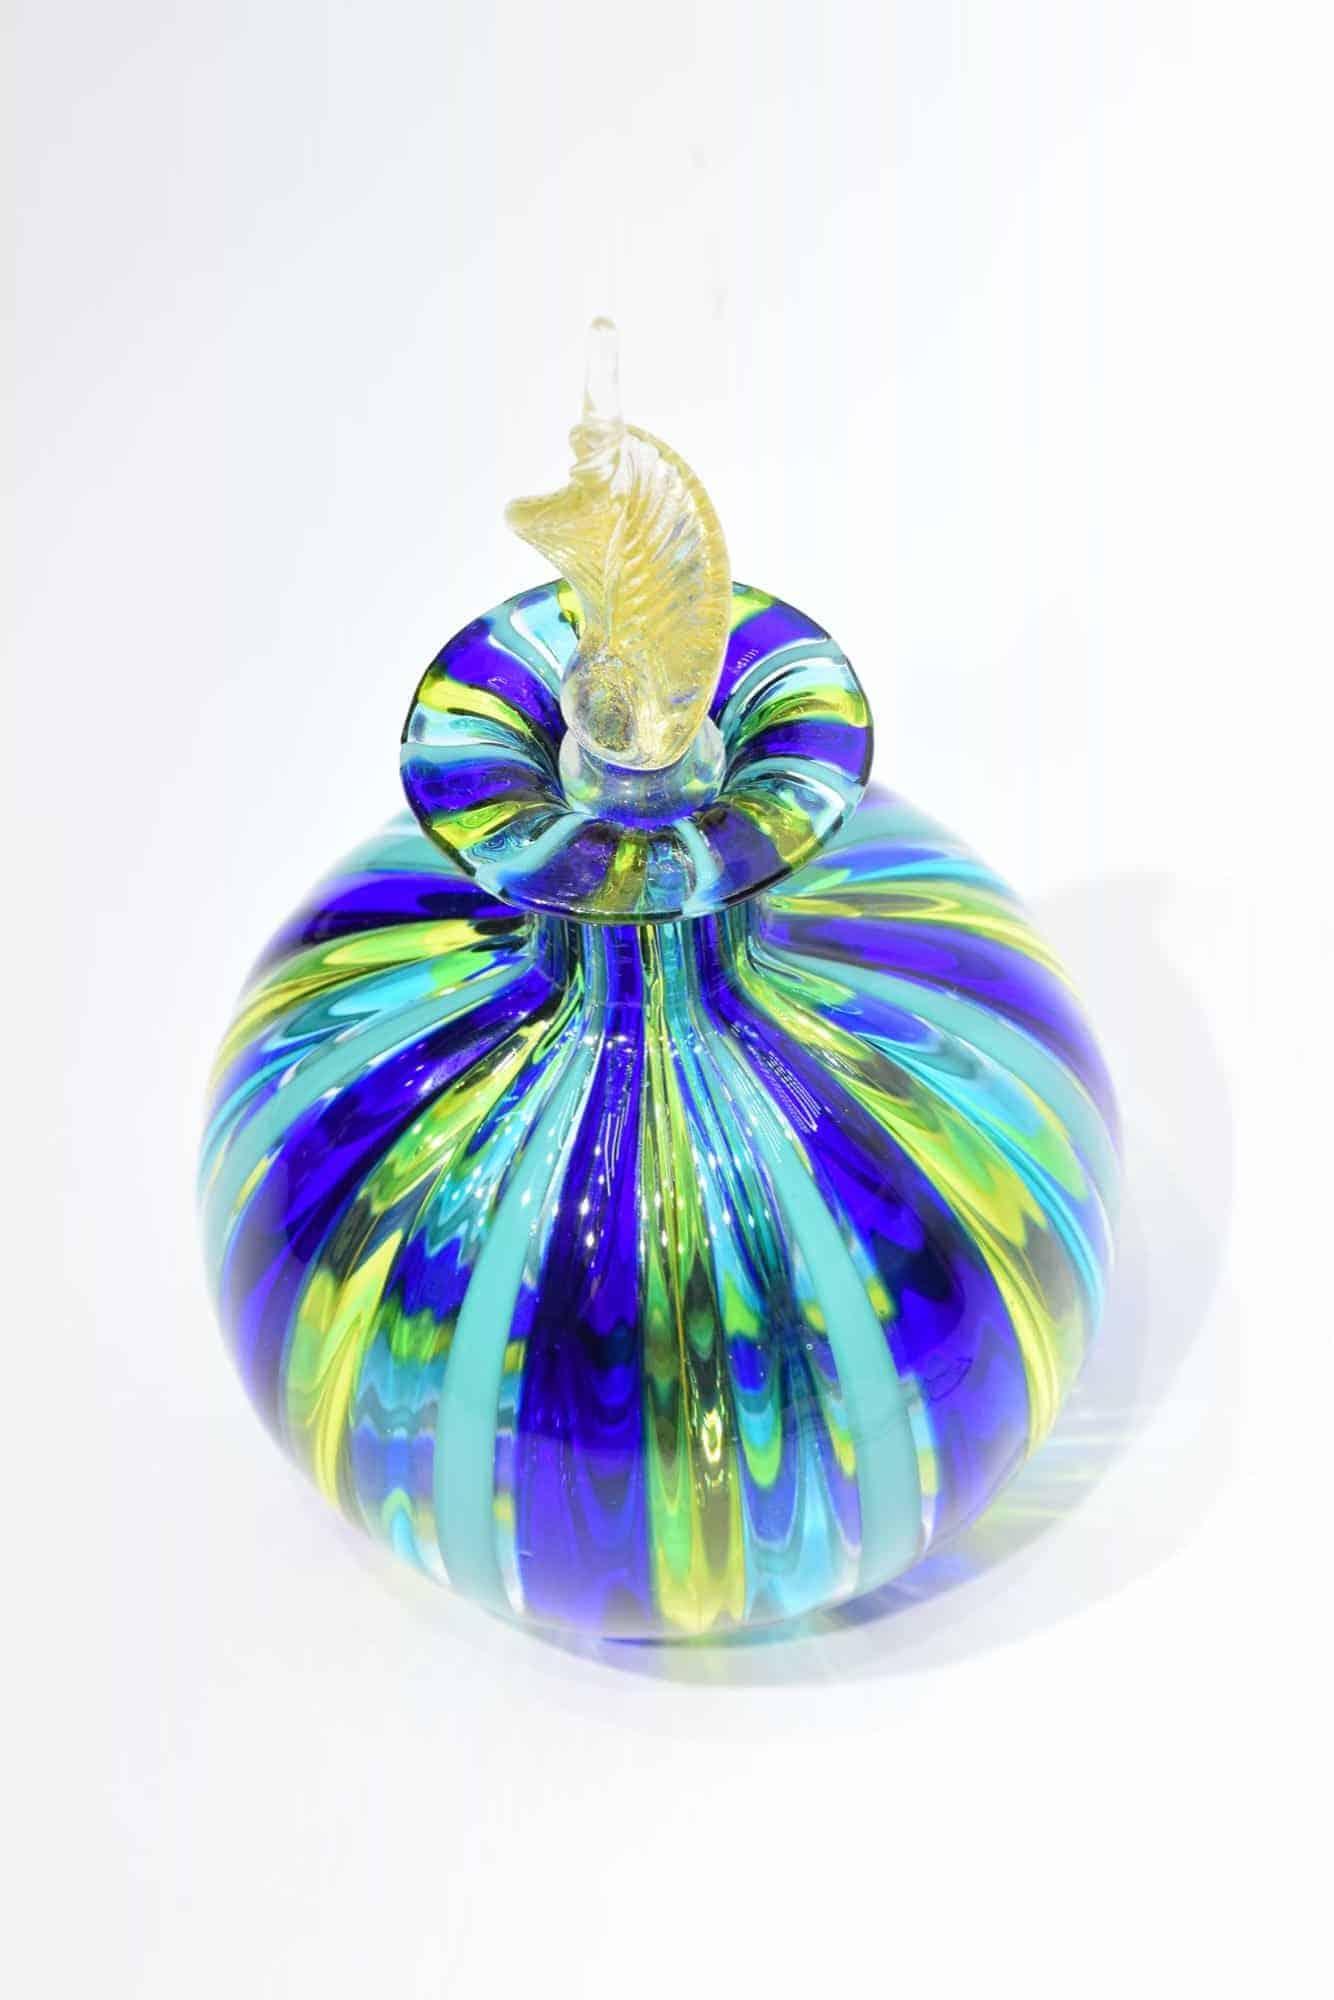 Murano Glas Reed Flasche - (Art. 33916)